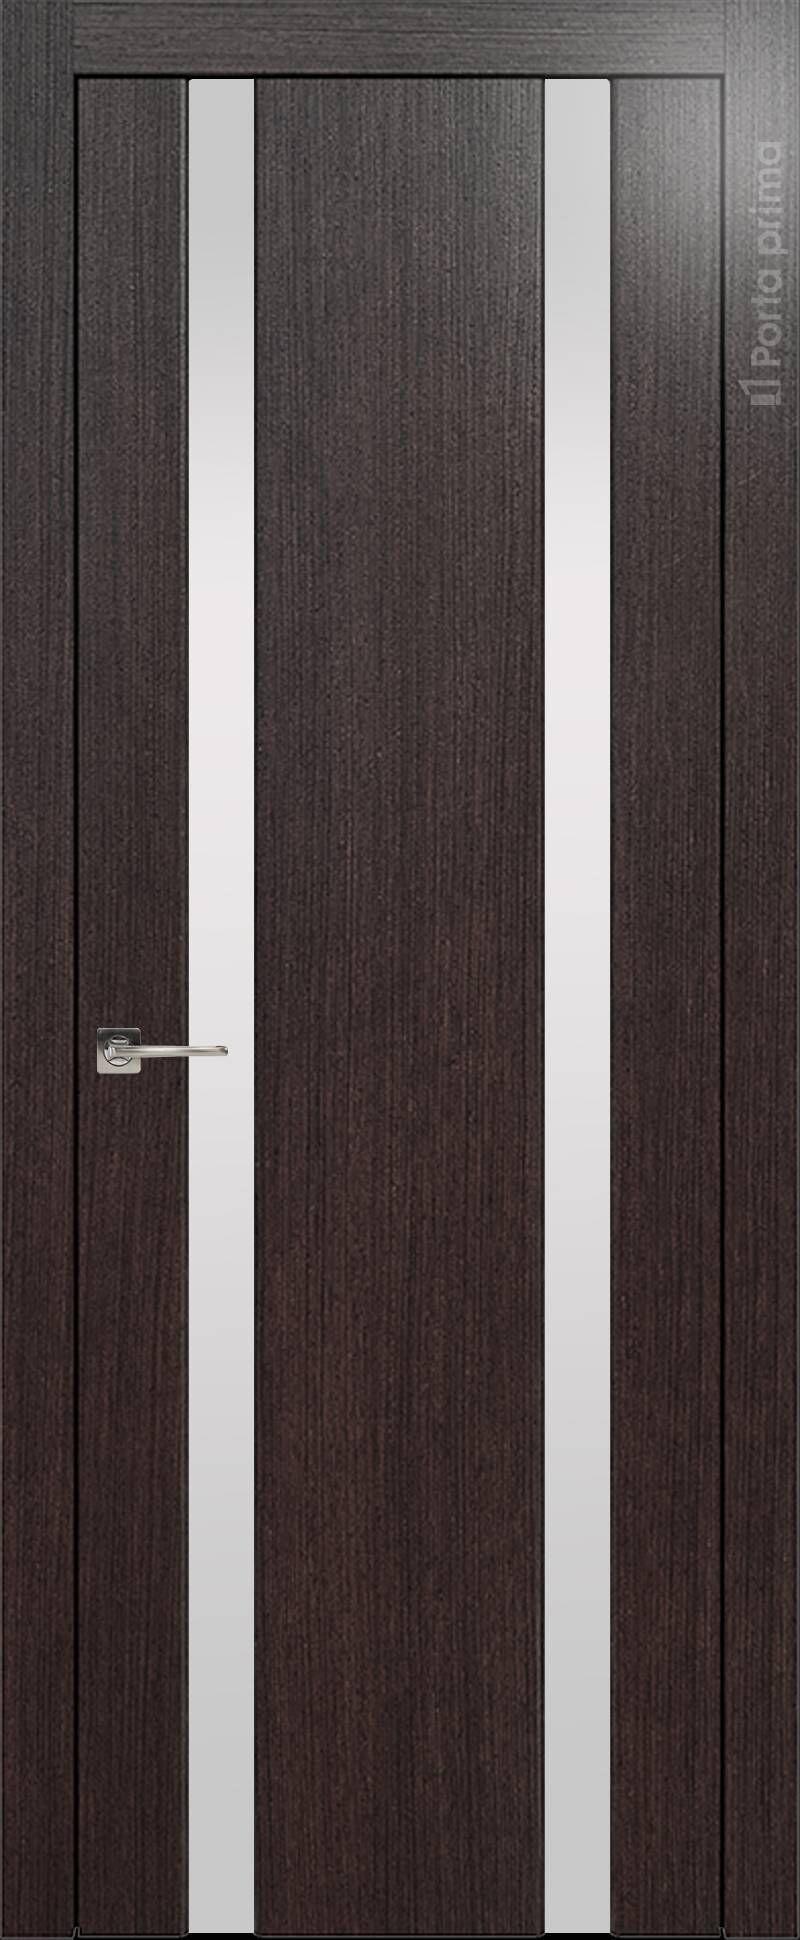 Torino цвет - Венге Шоколад Без стекла (ДГ-2)